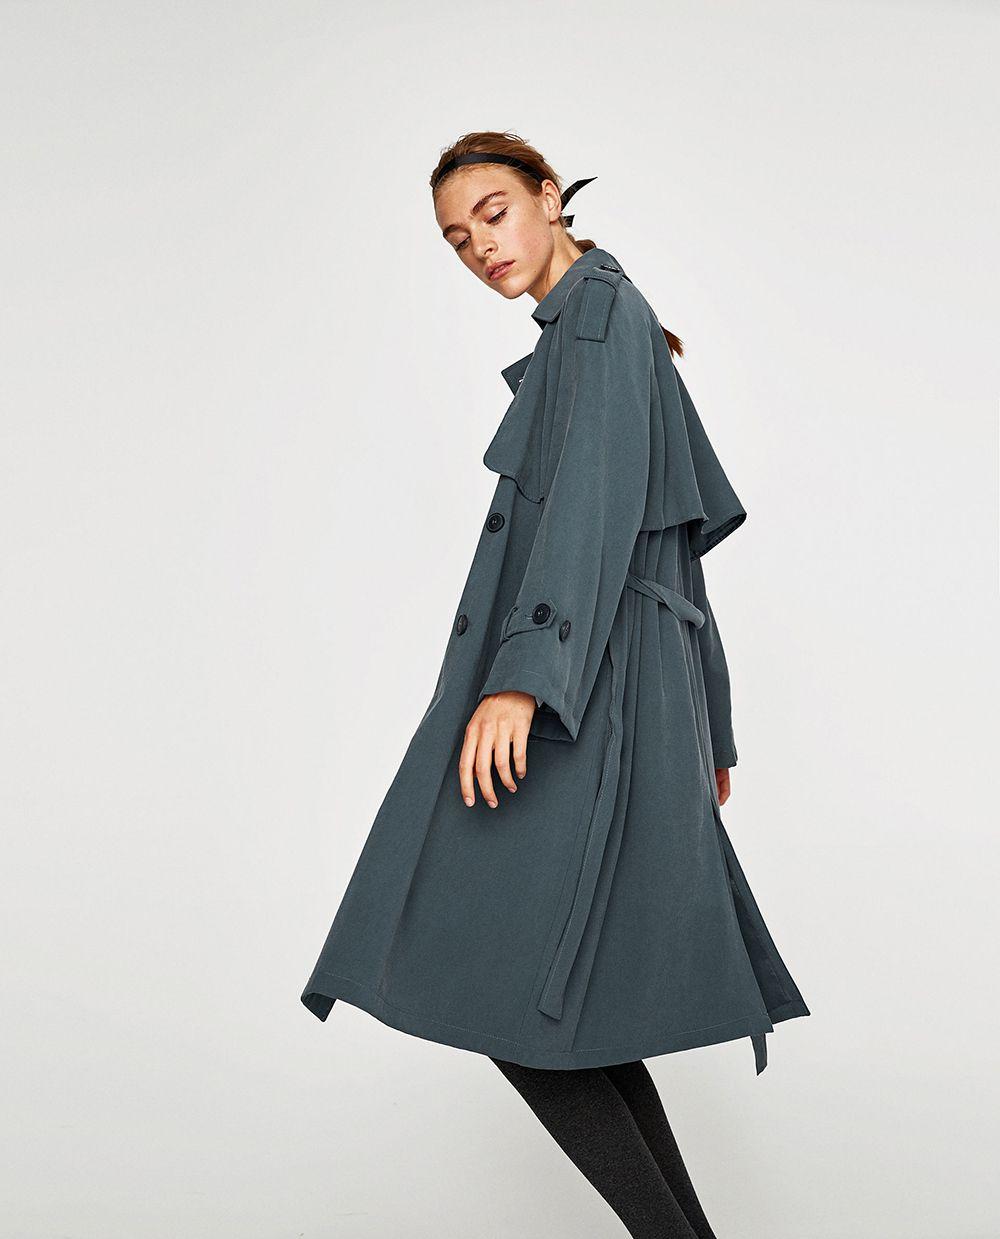 f61f9fe23dba The 10 Best Trench Coats From Zara. The 10 Best Trench Coats From Zara  Trench Coats